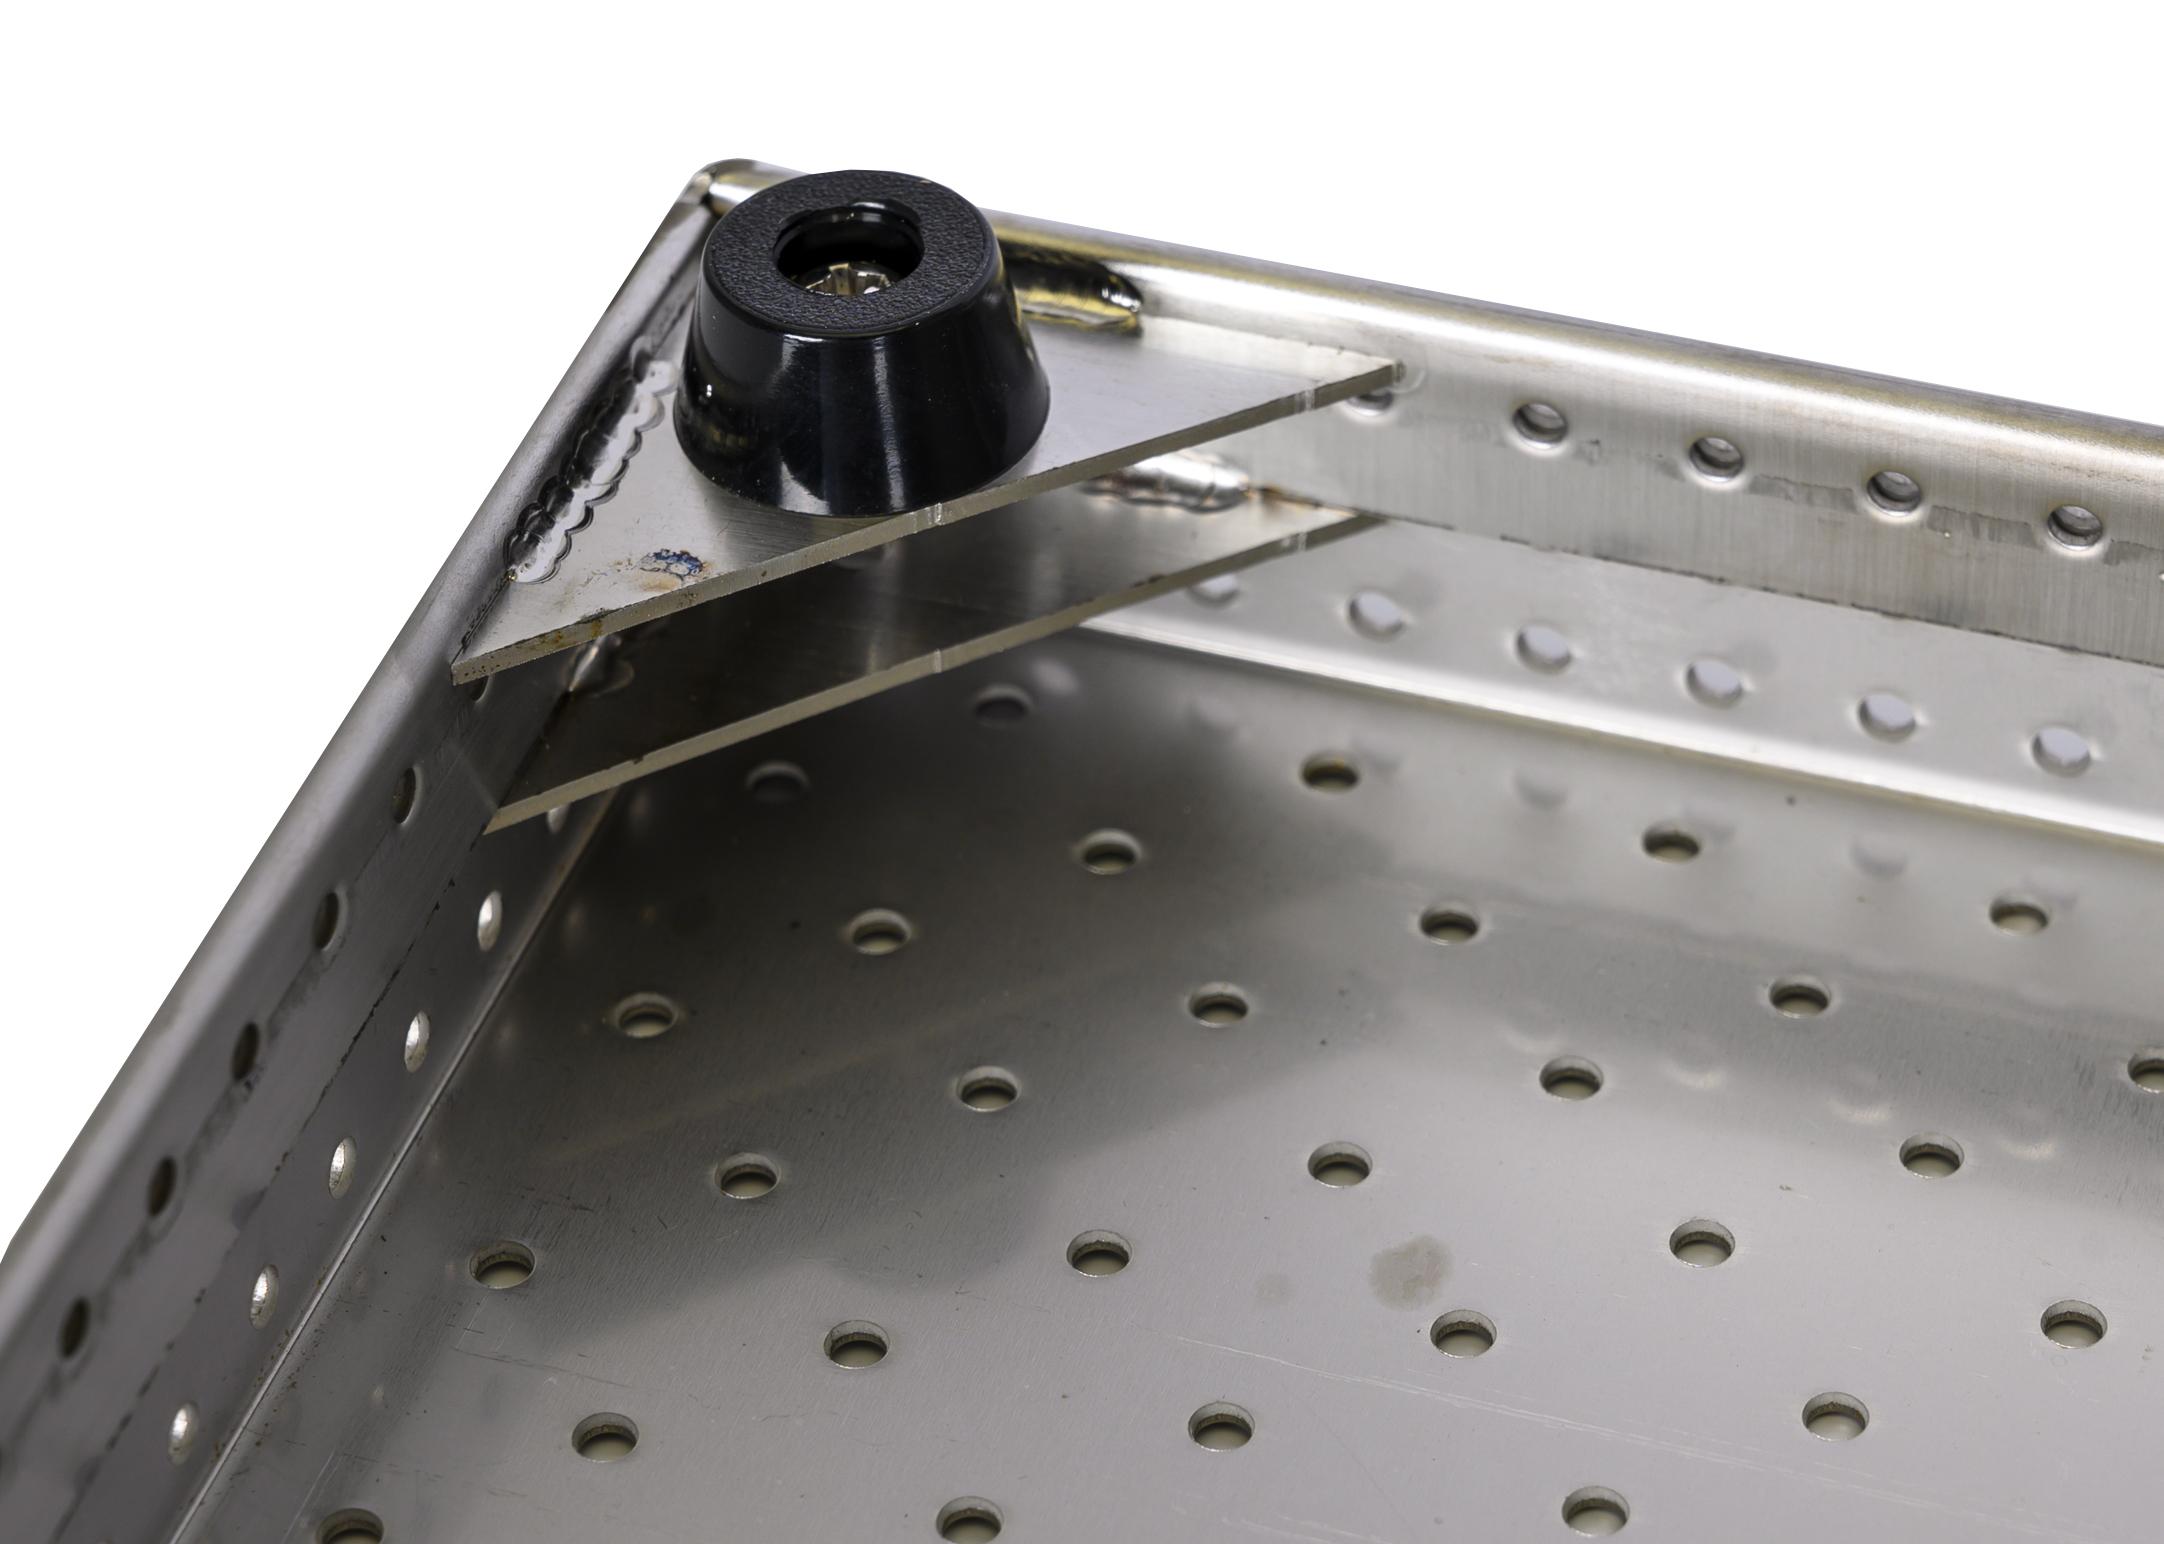 Groom-X Bath Grid Stainless Steel 85x50x3cm